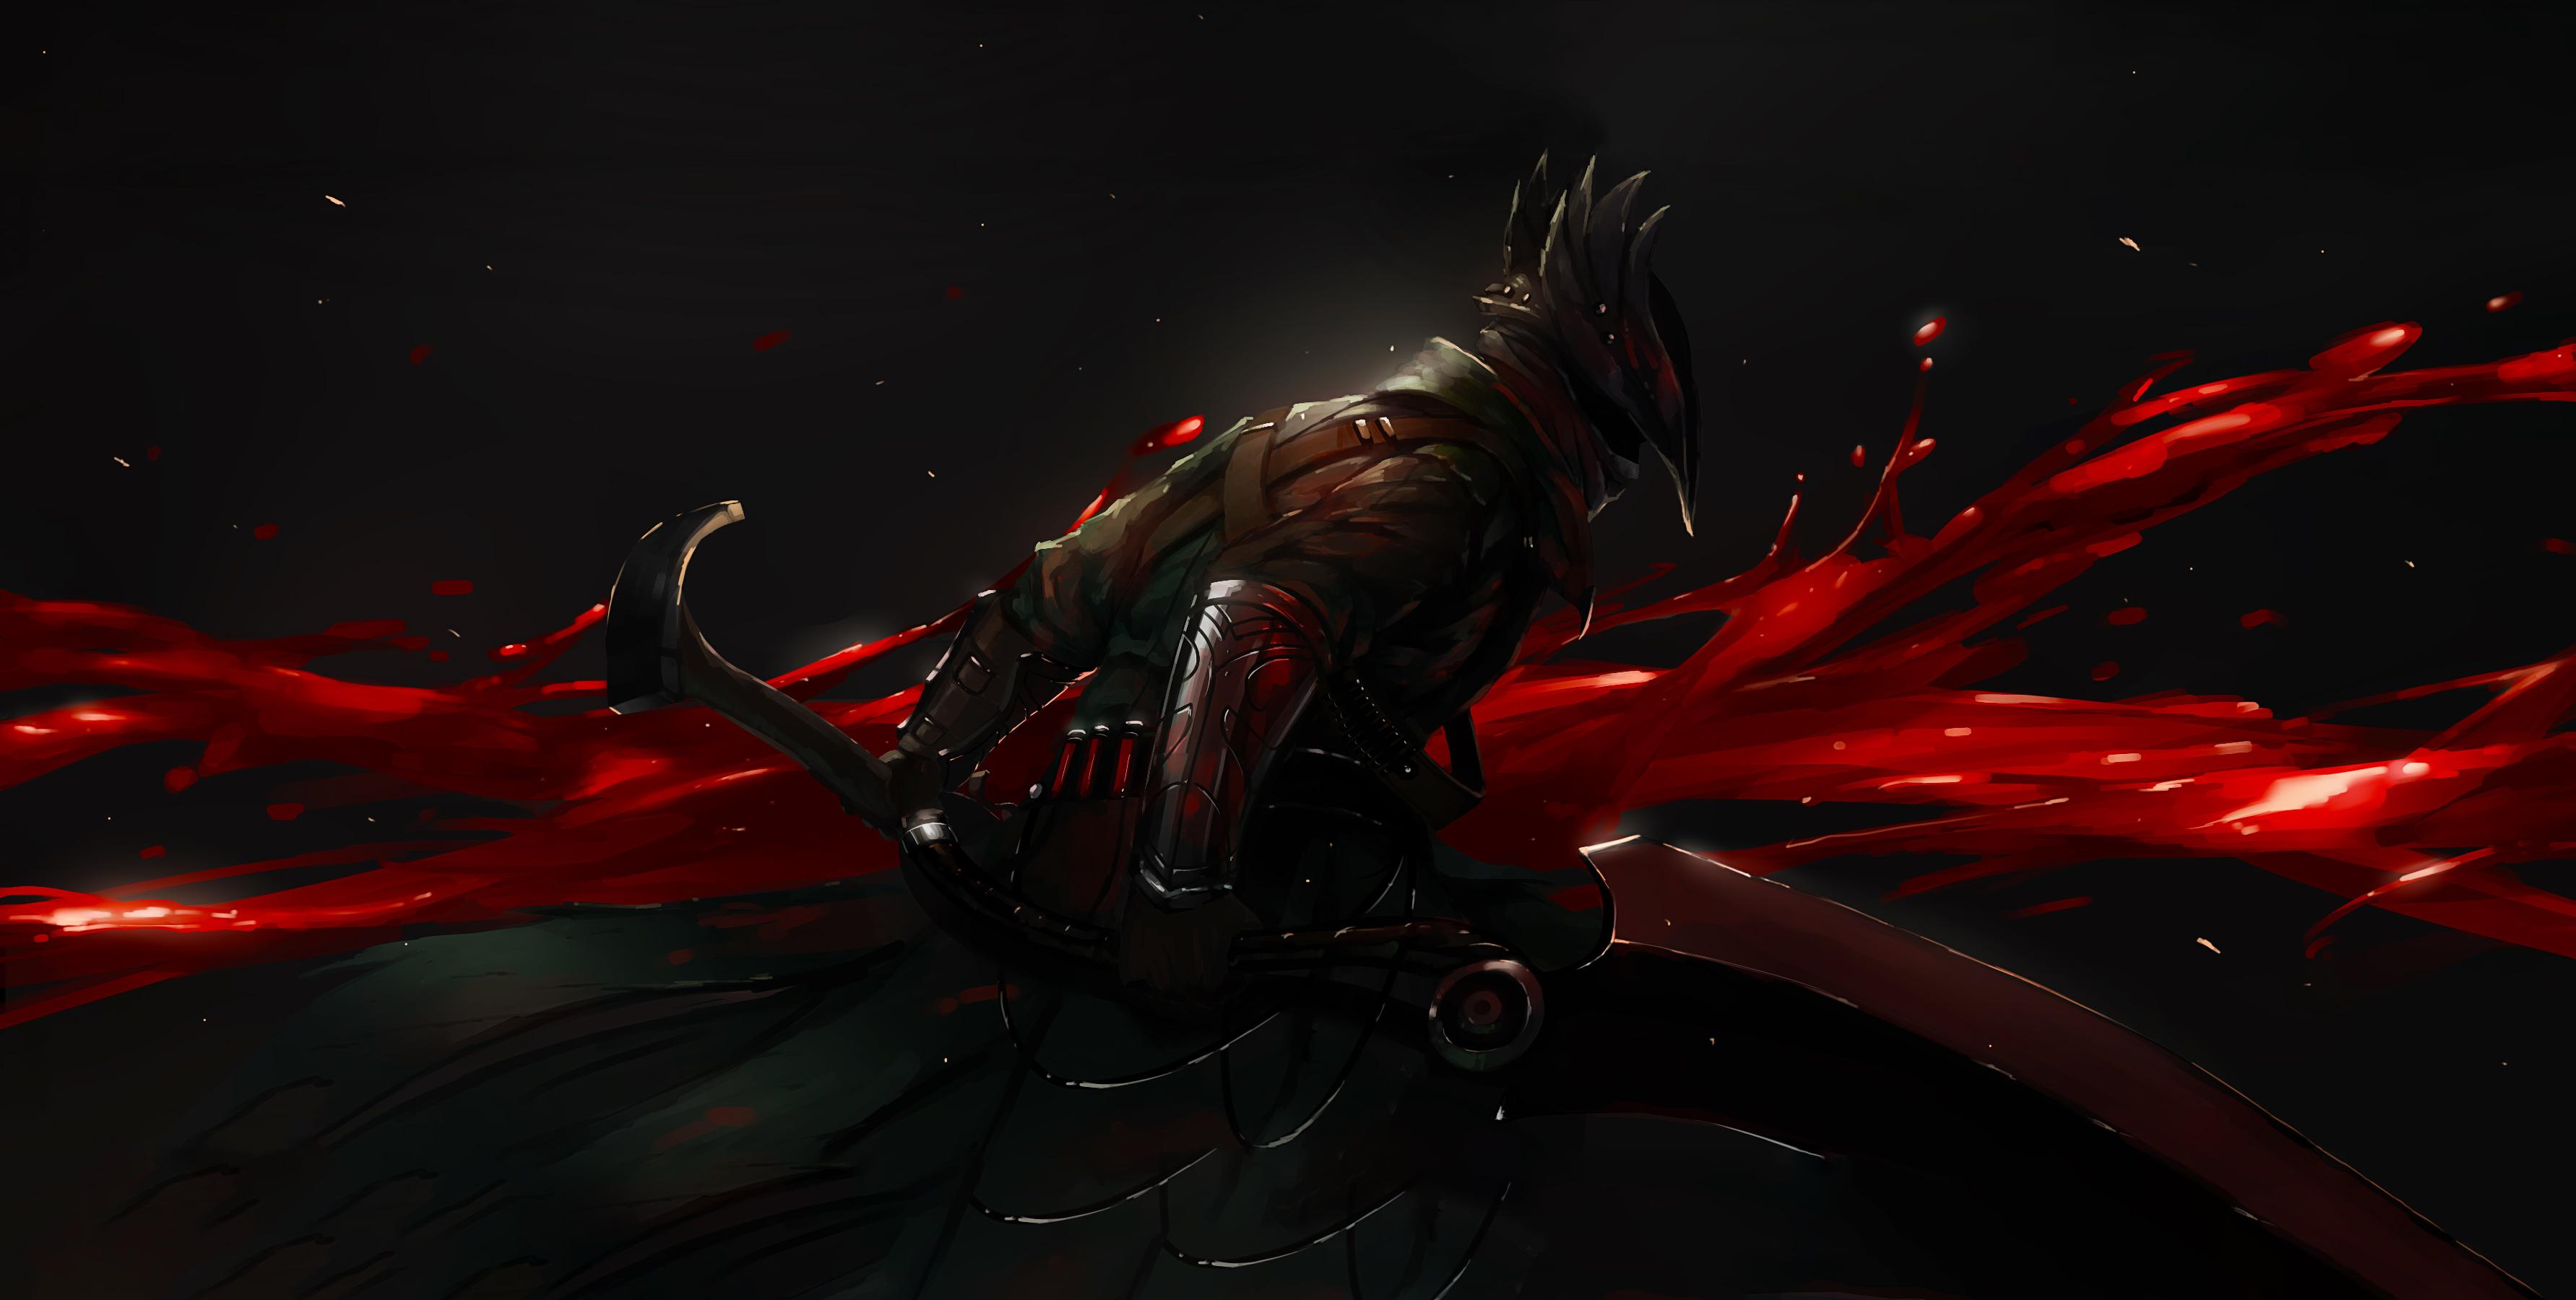 Bloodborne Knight Sword 4k, HD Games, 4k Wallpapers